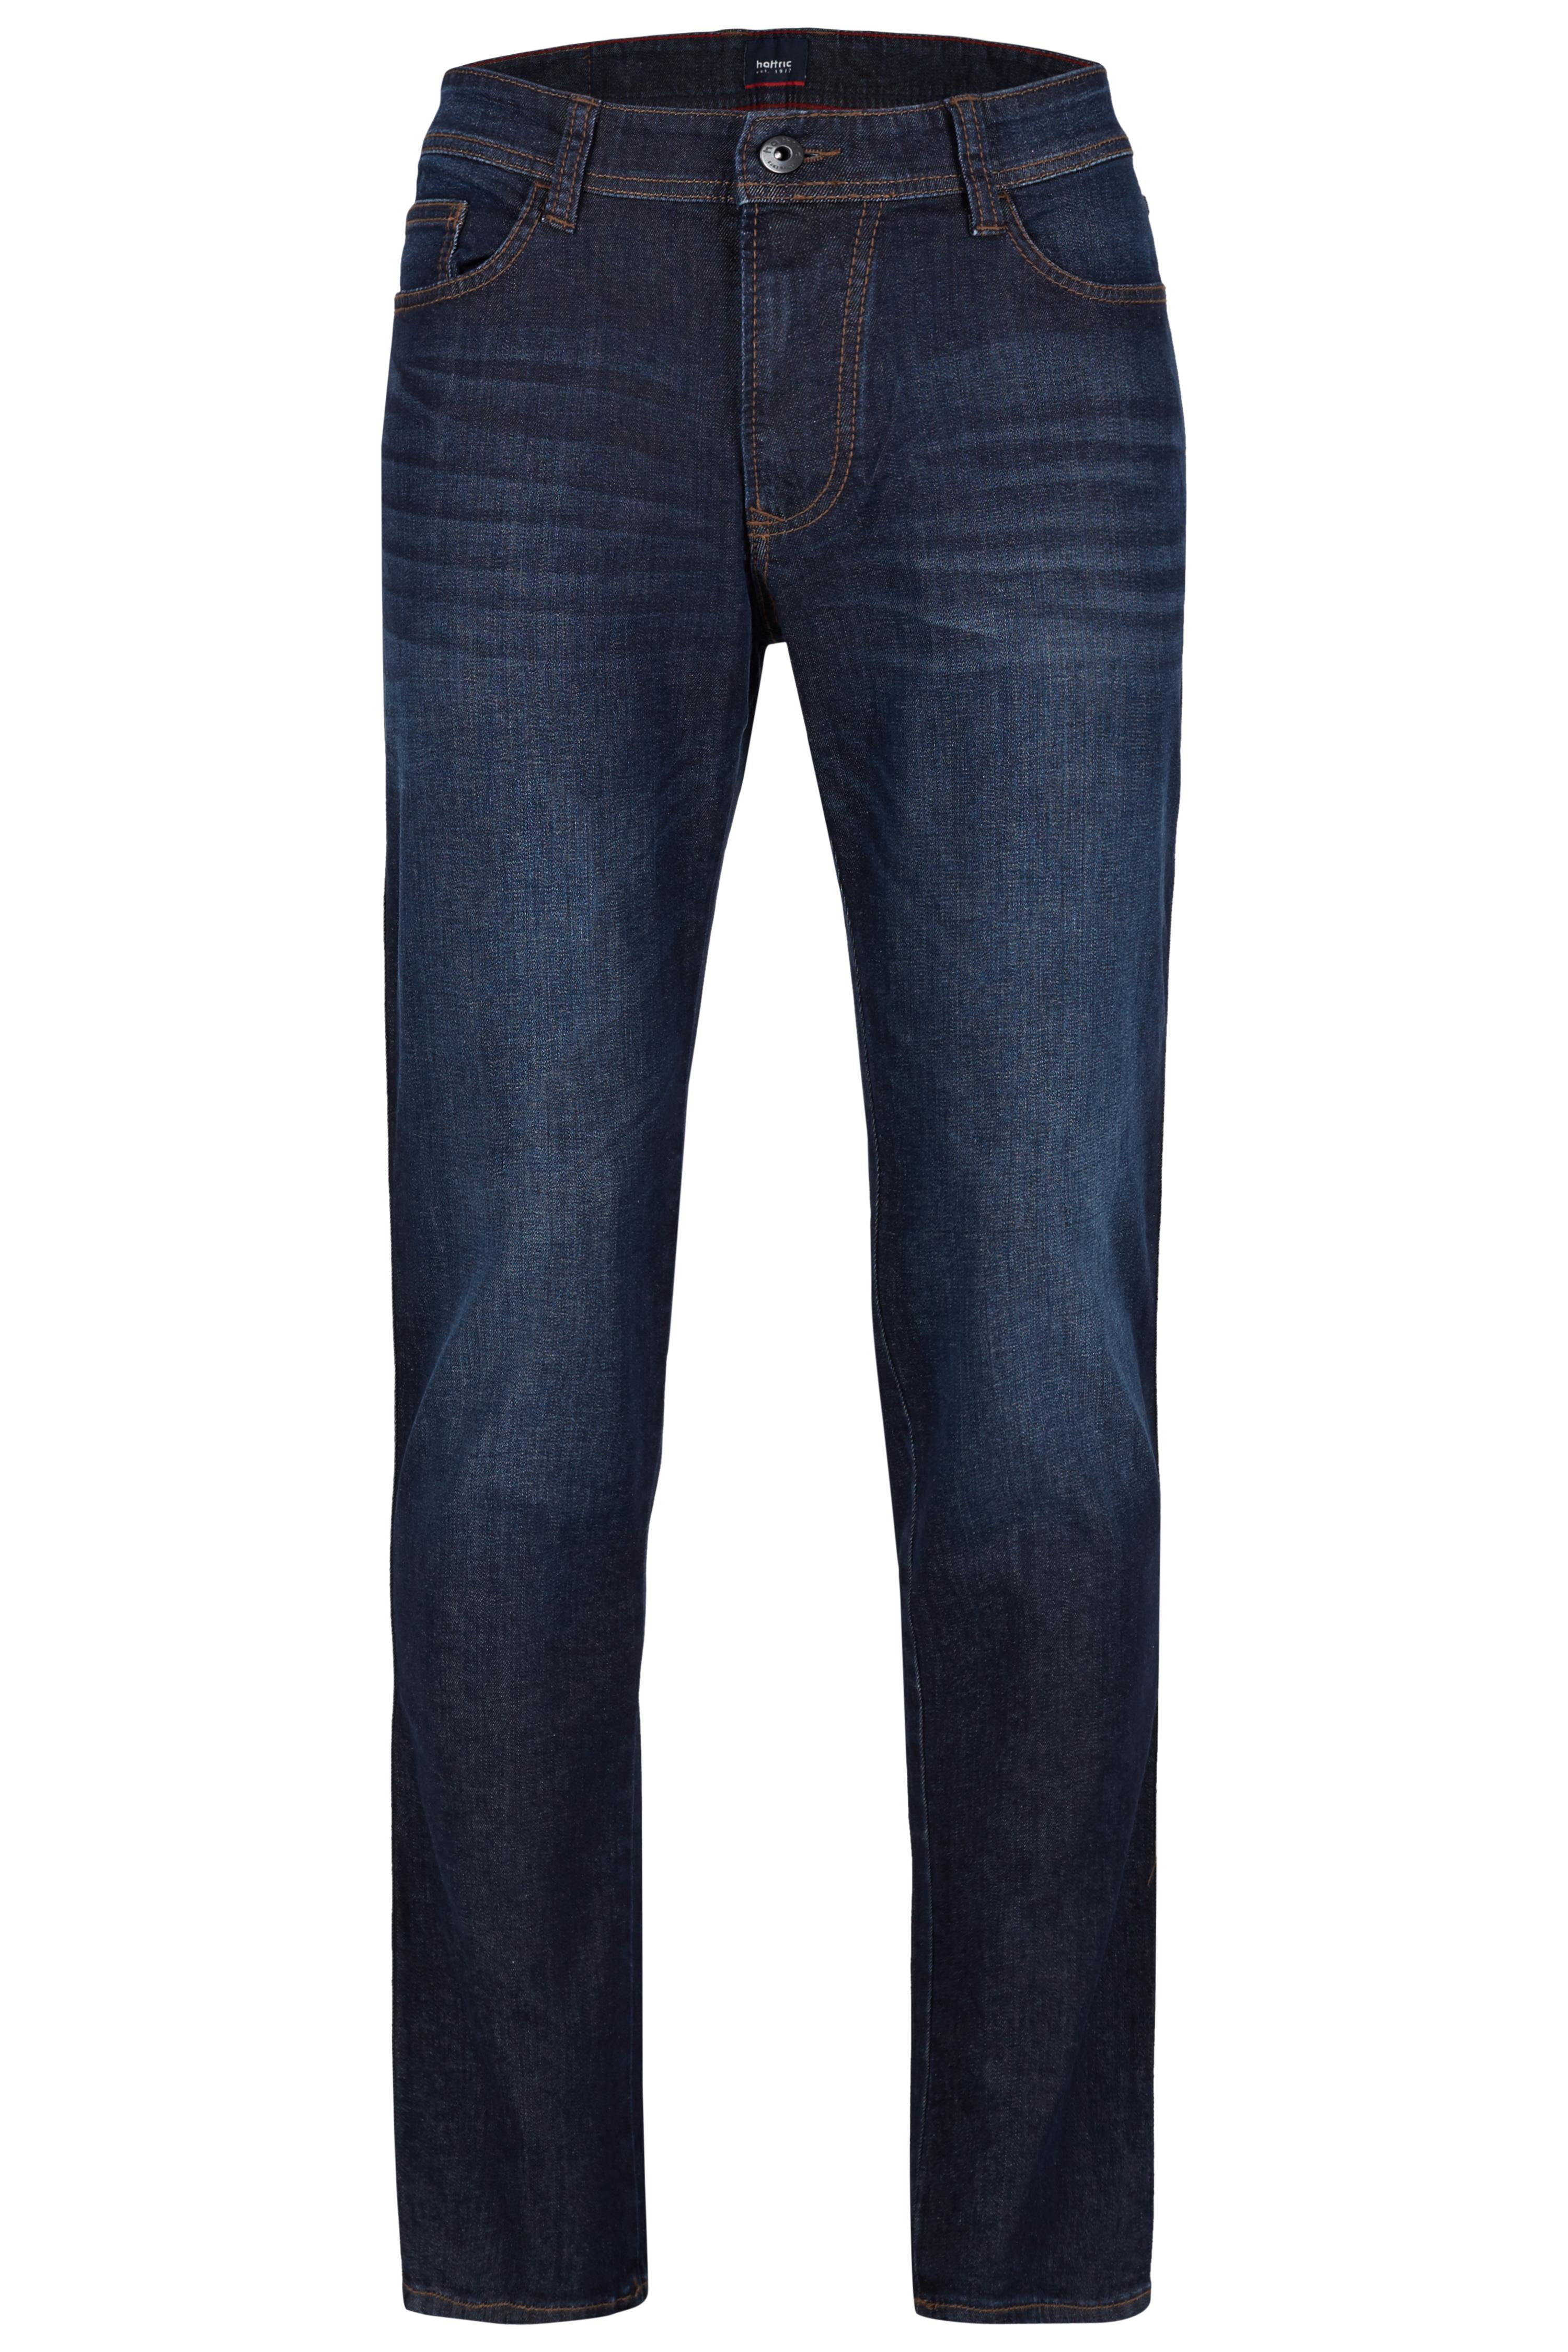 jeans hunter in regular fit fashion styles. Black Bedroom Furniture Sets. Home Design Ideas